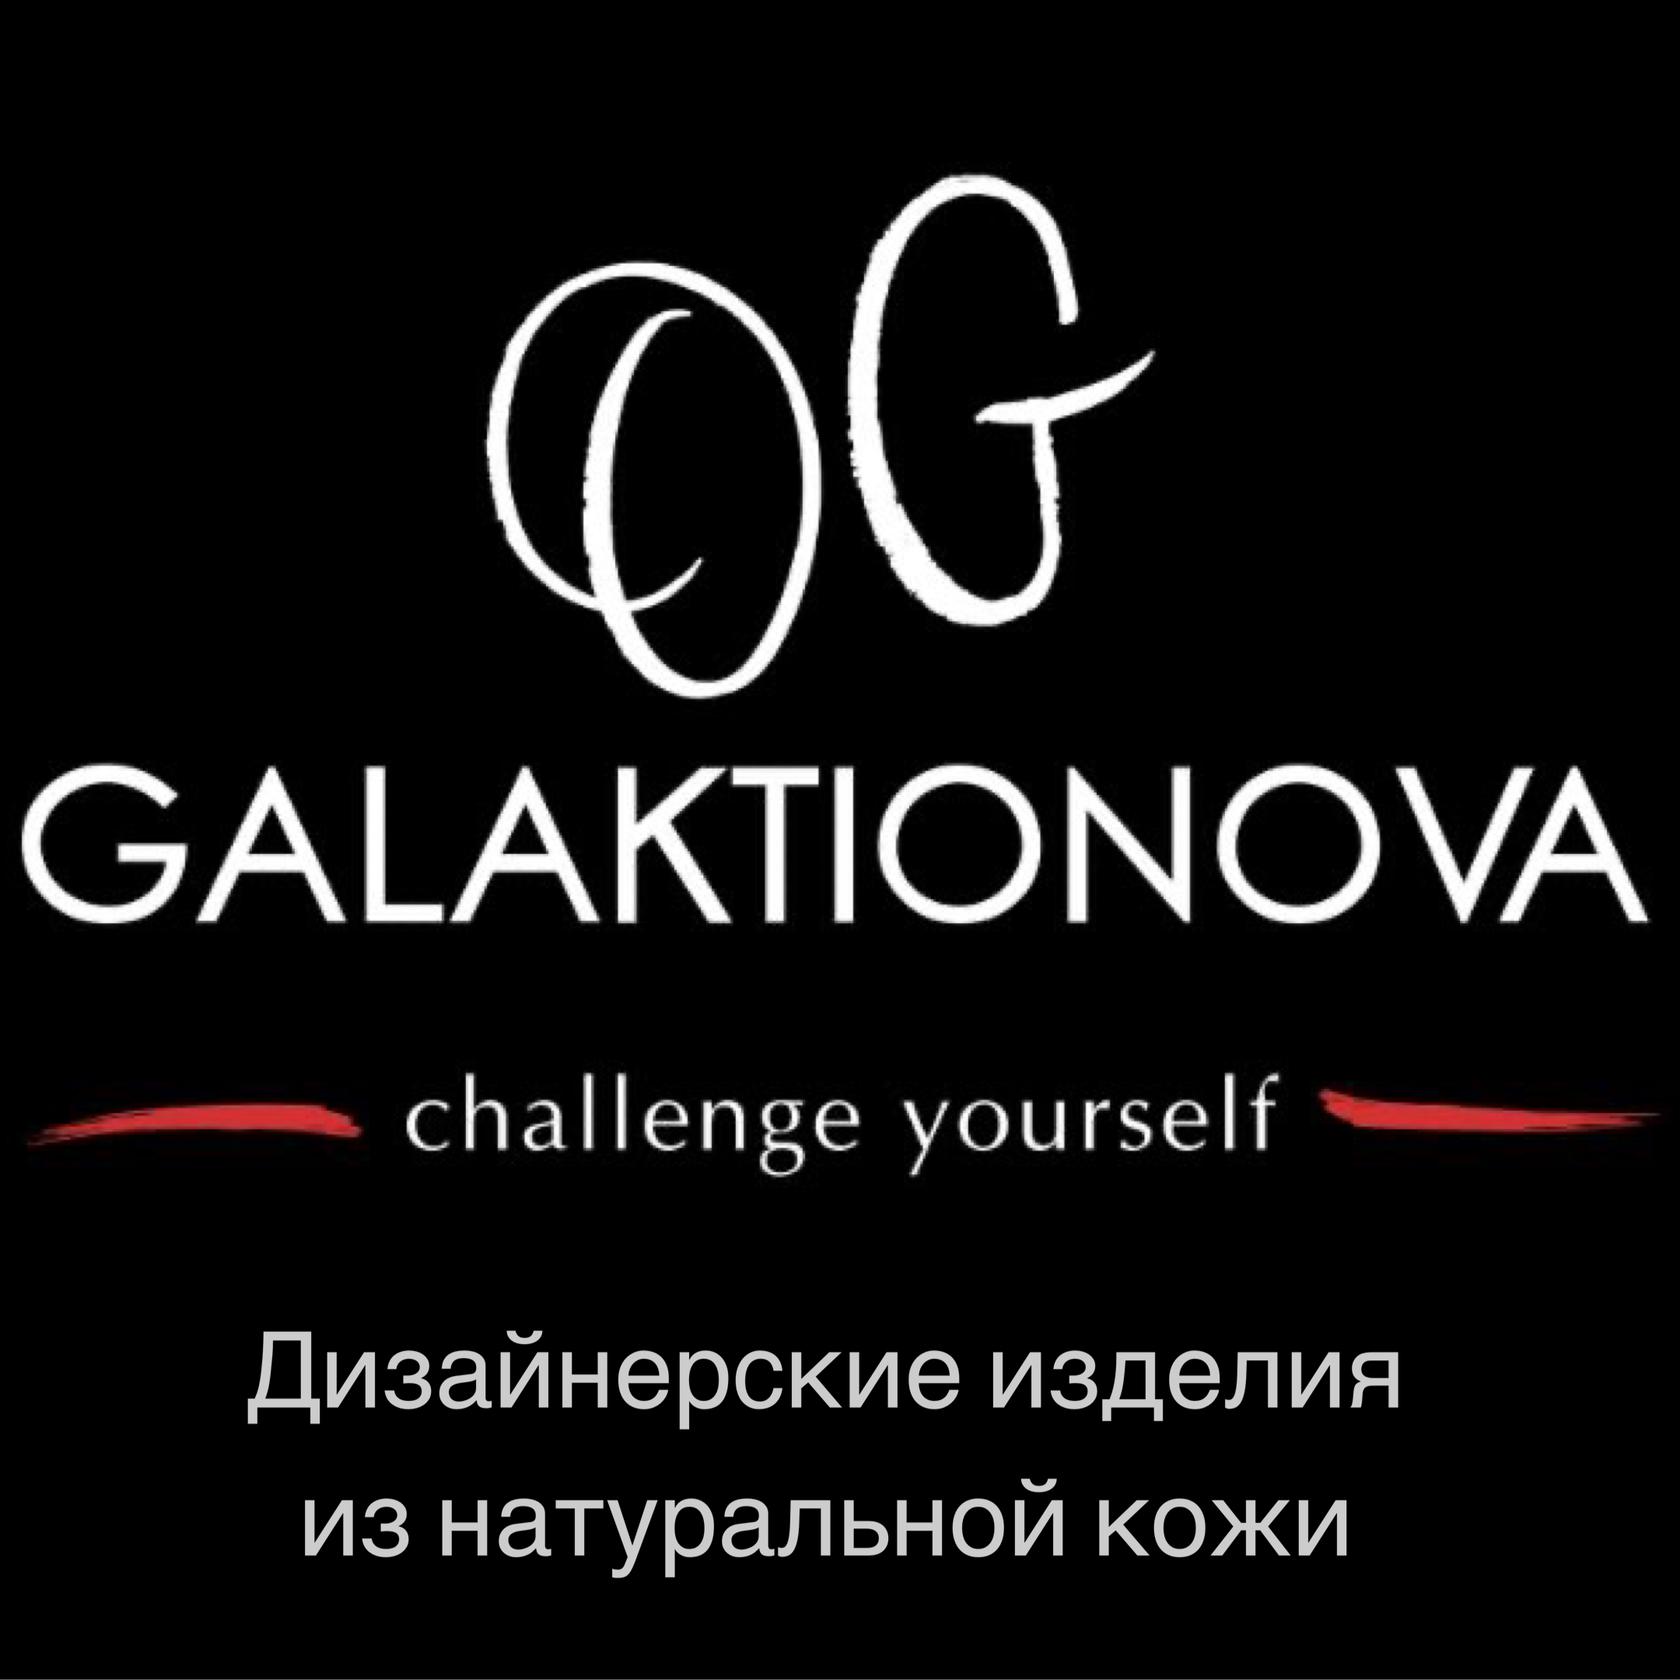 OG GALAKTIONOVA